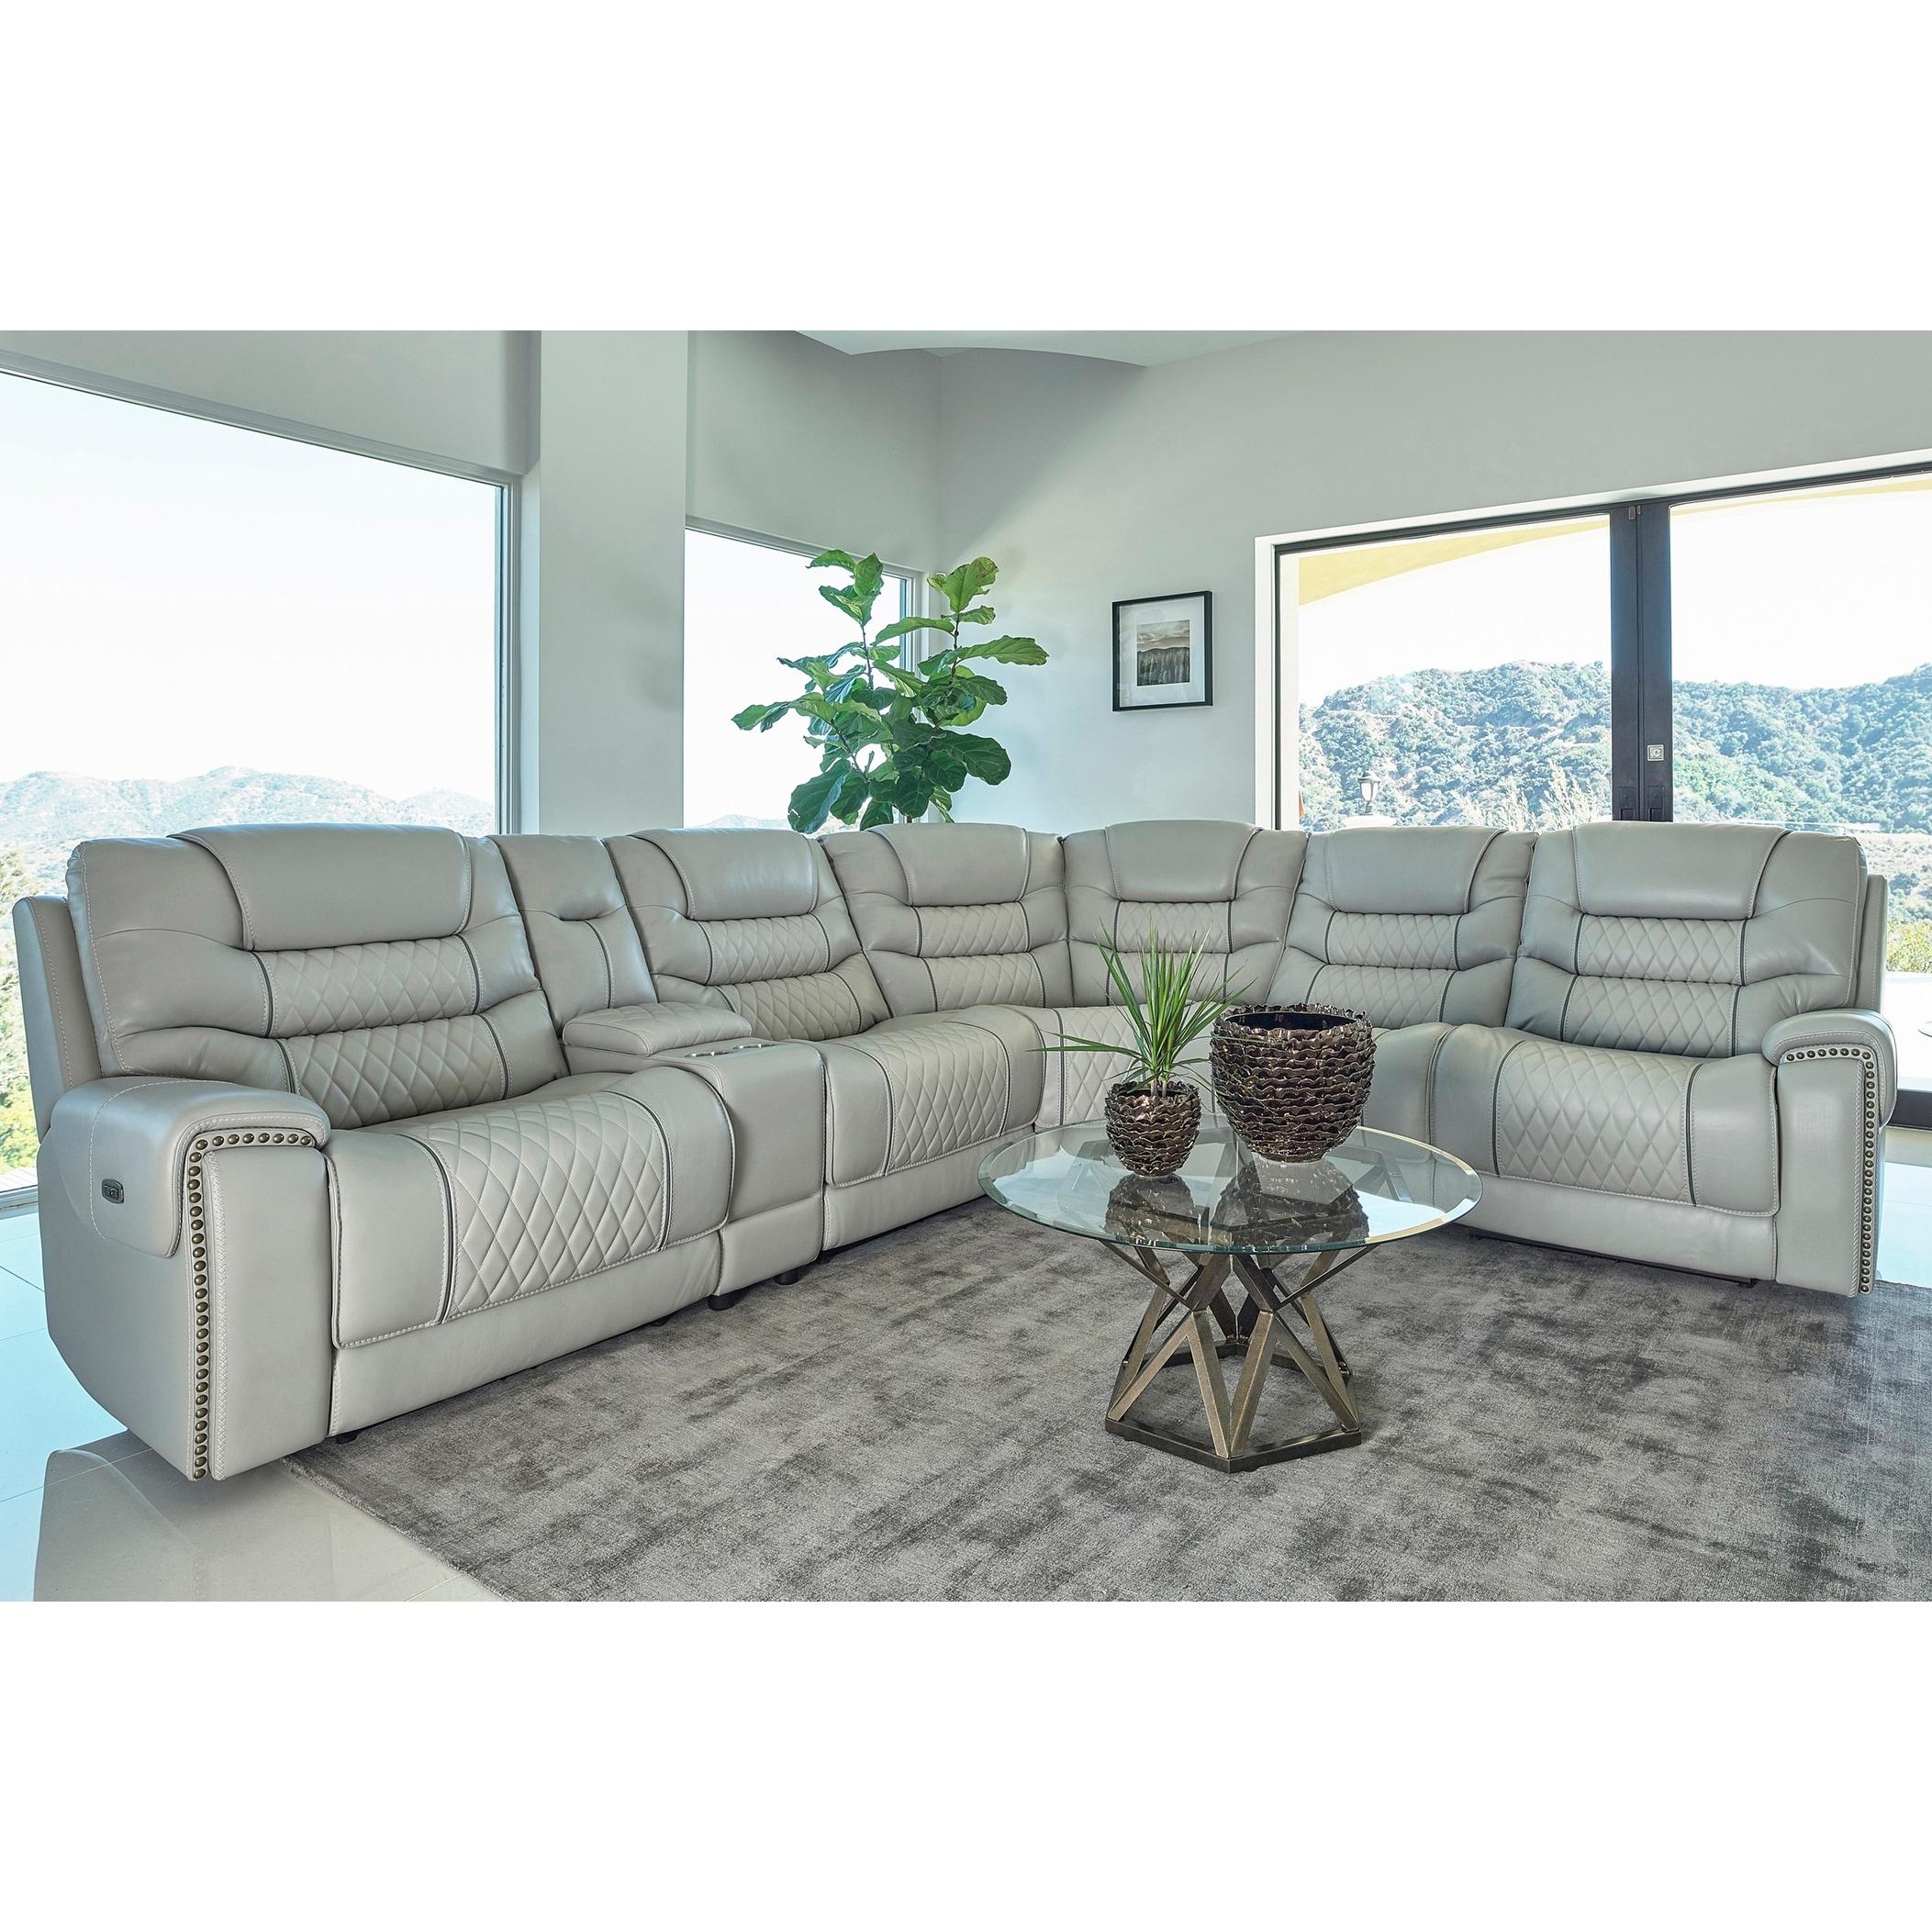 Shop Garnet Light Grey 6 Piece Upholstered Power Reclining Seats With Power Headrests Sectional Overstock 31724999